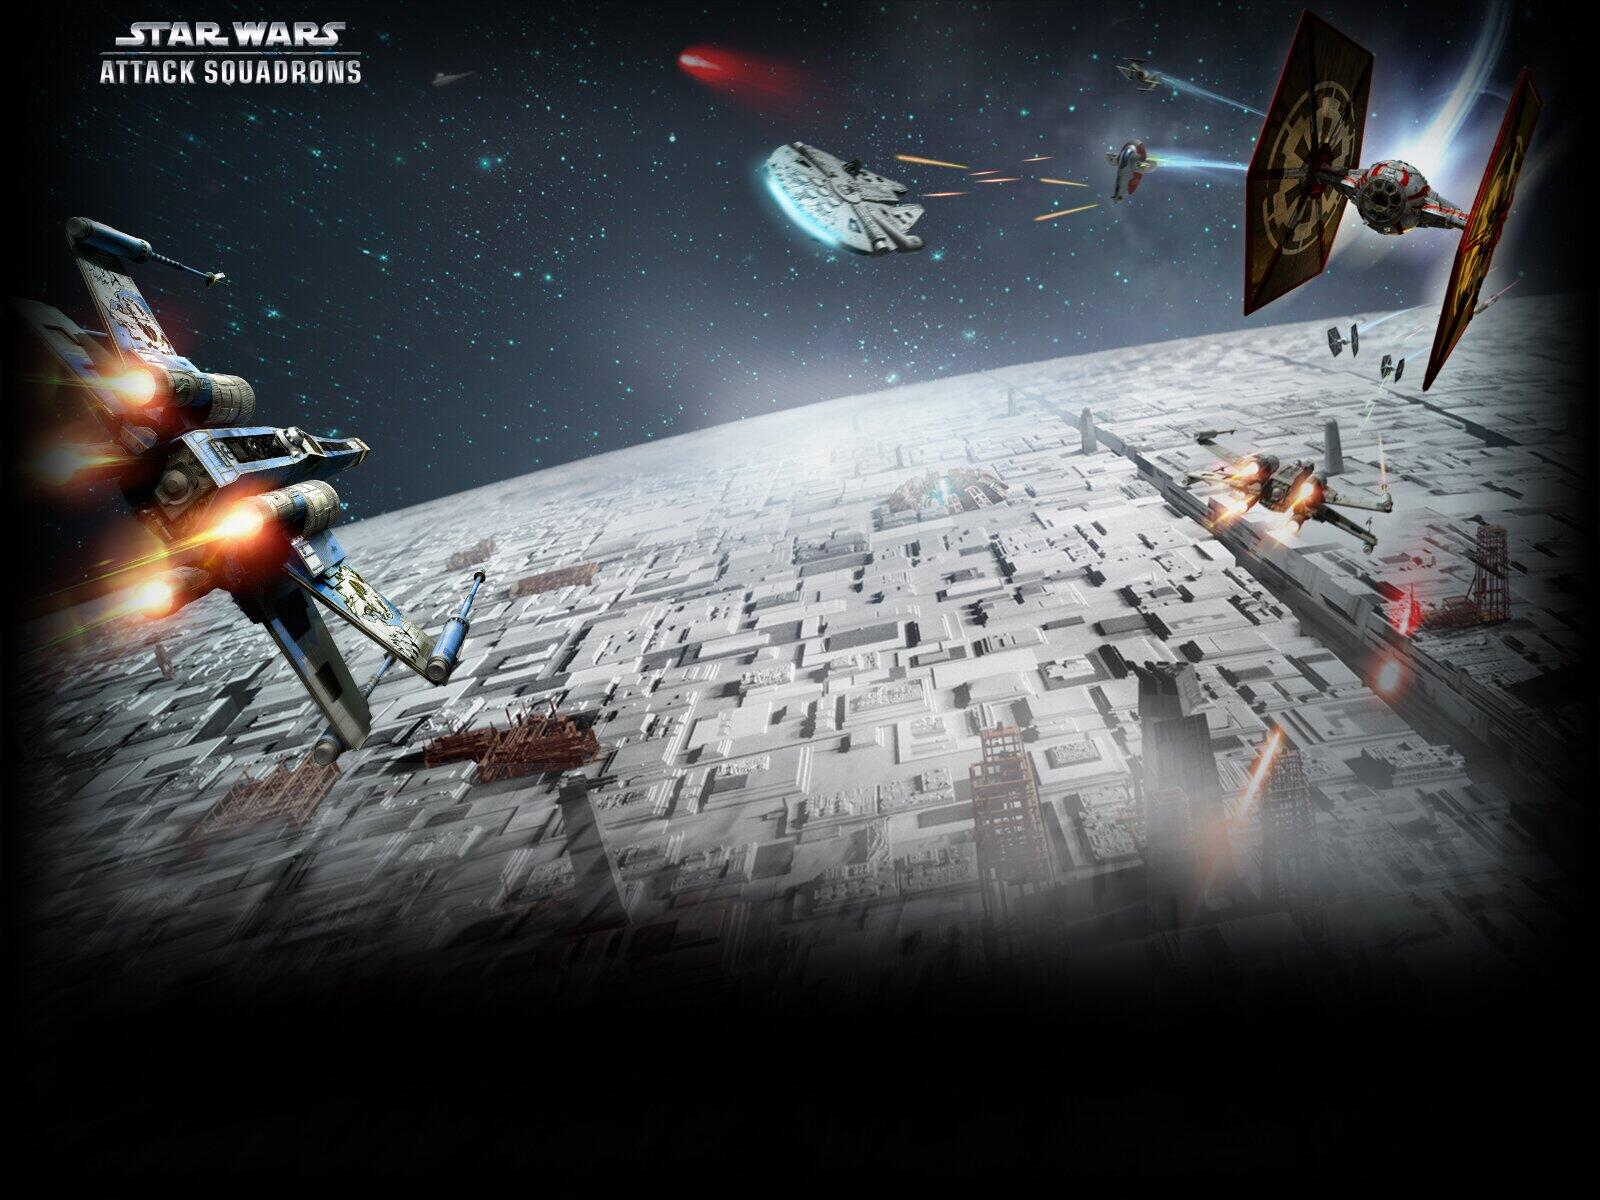 Star Wars: Attack Squadrons wallpaper 1